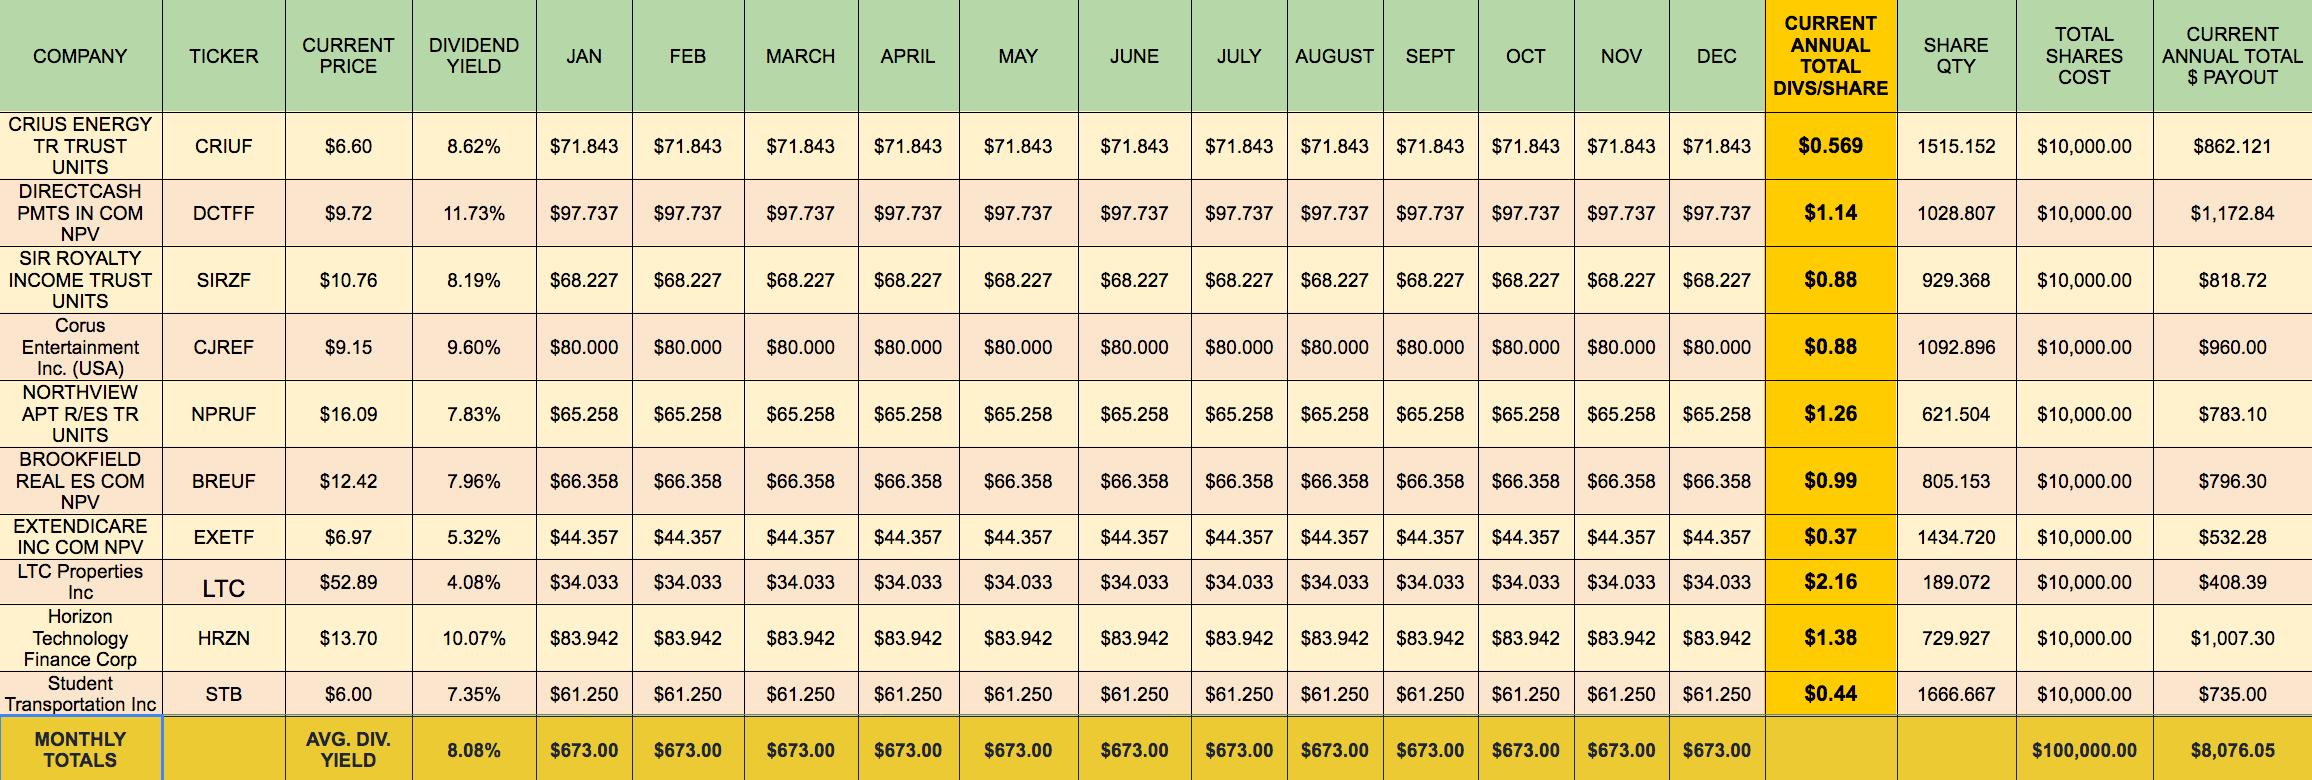 Building A Monthly High Dividend Stock Portfolio Calendar - Part 1